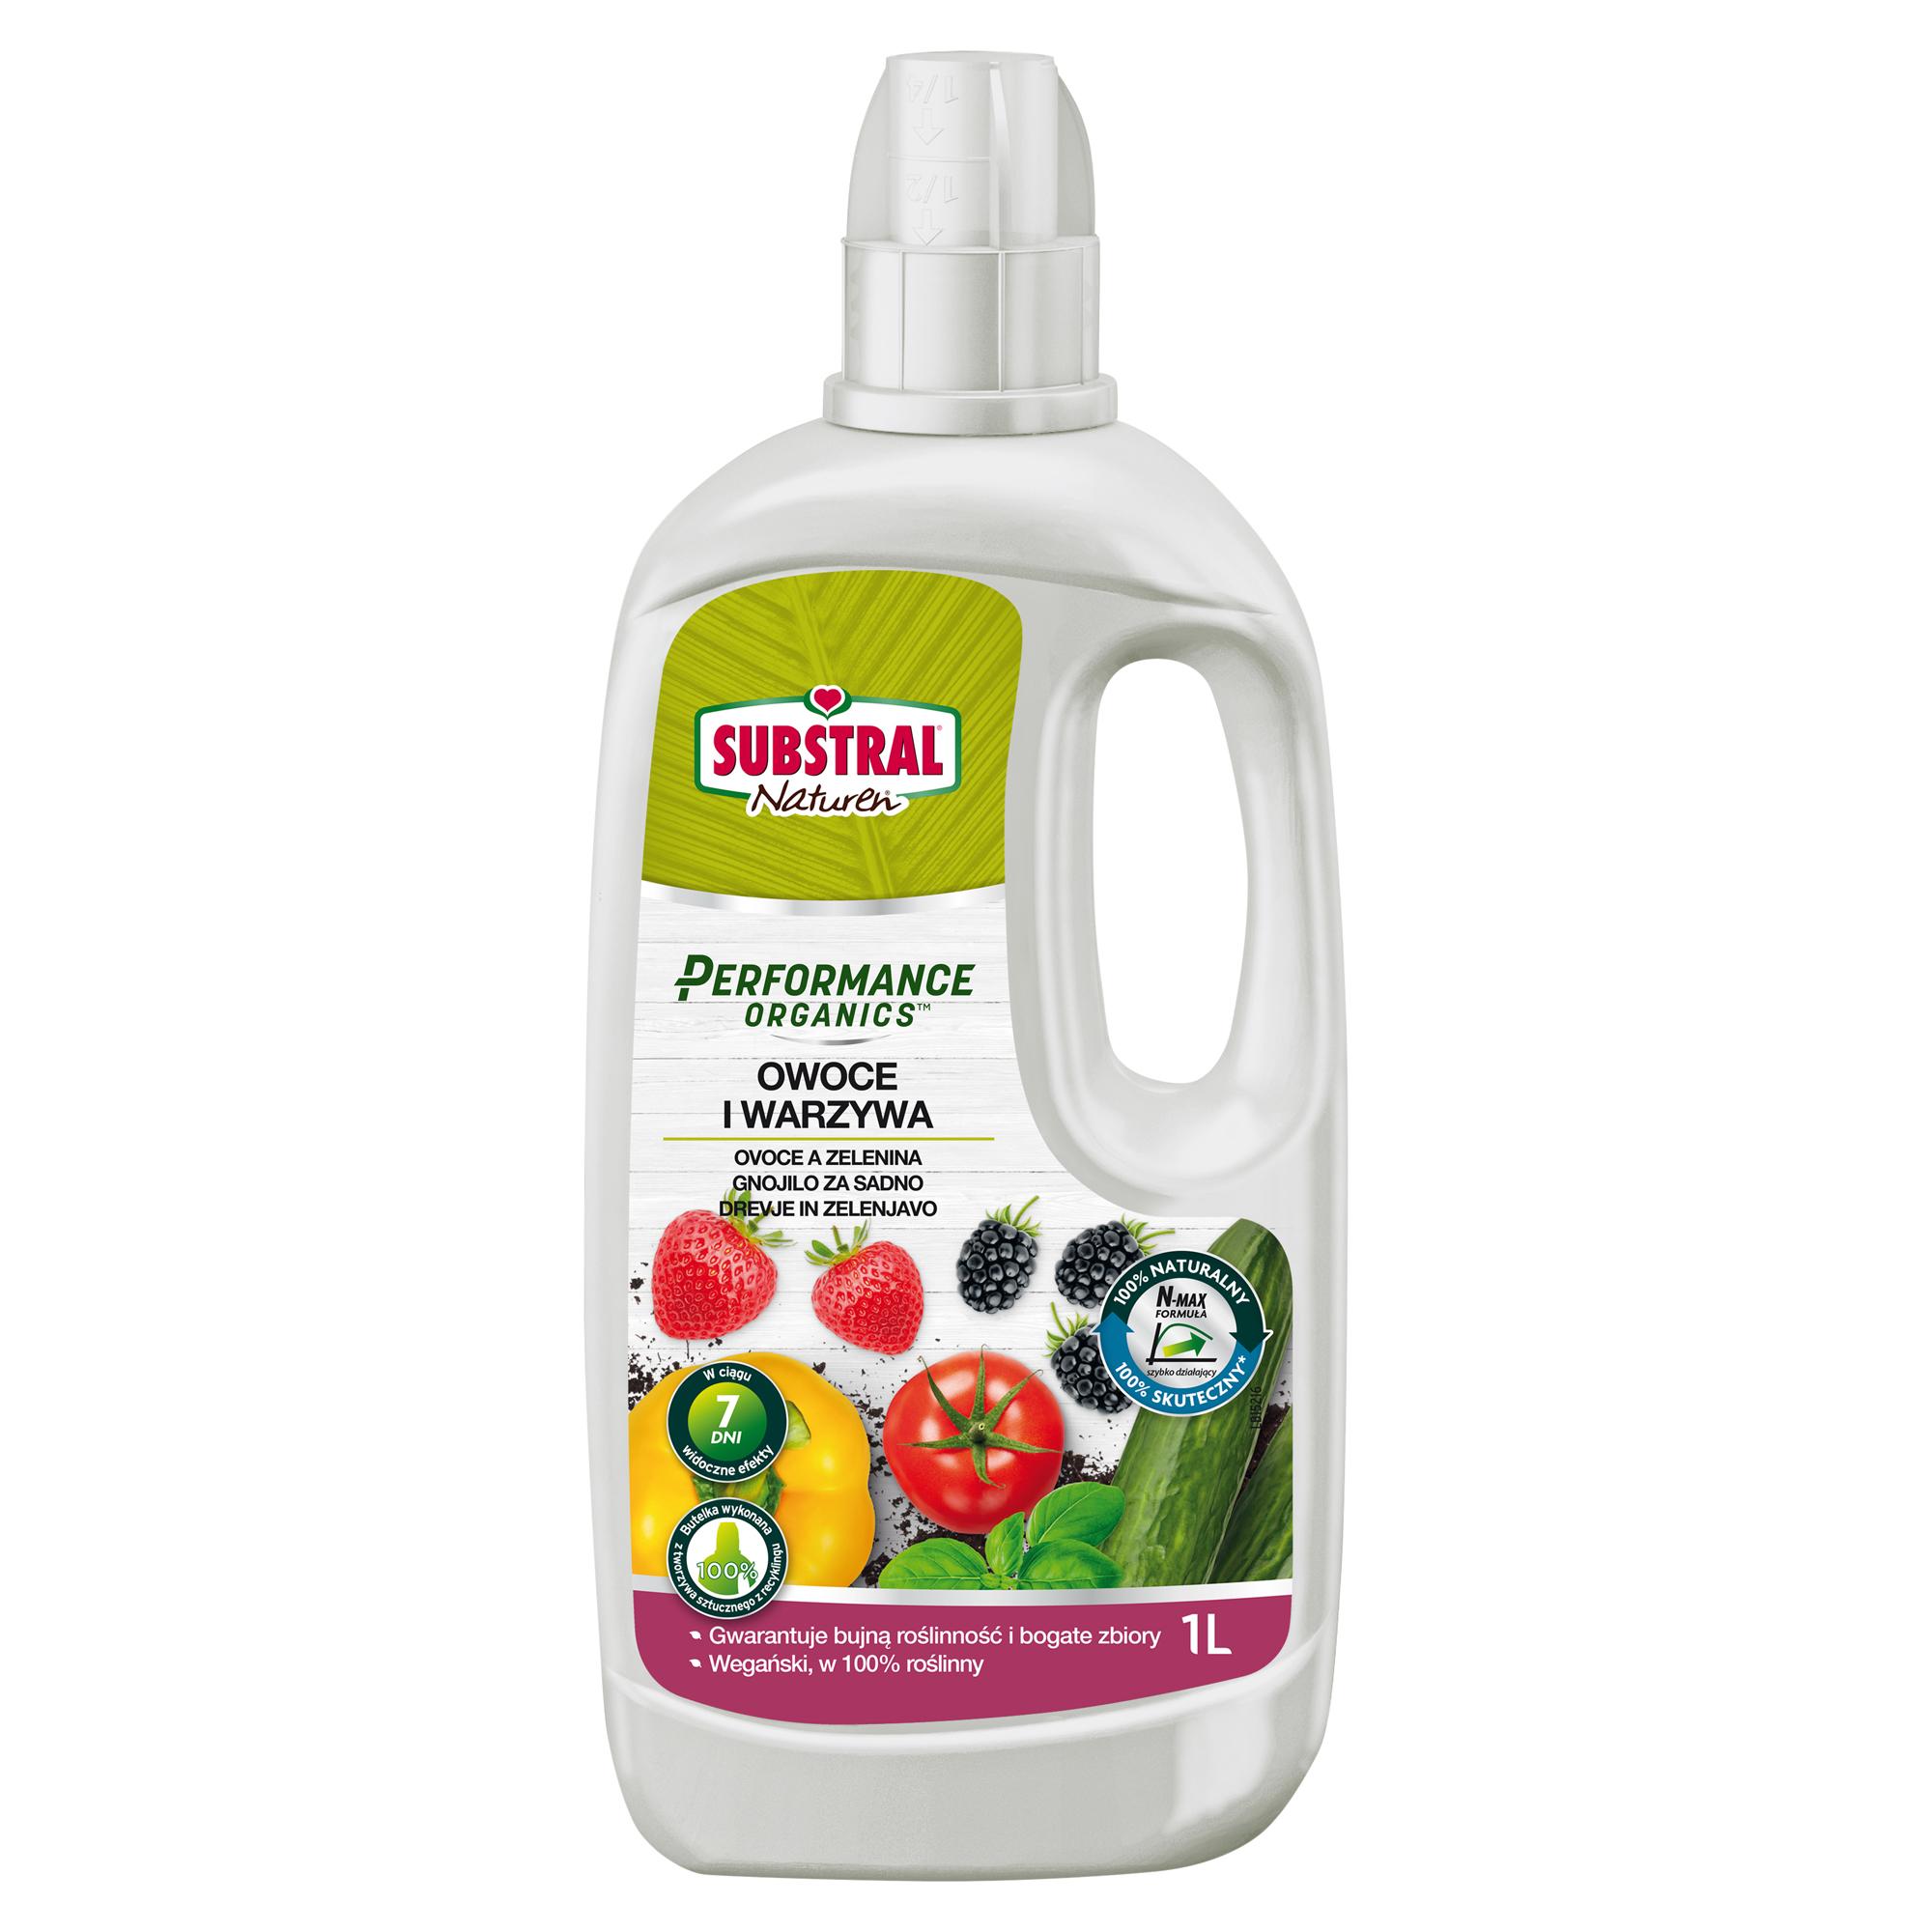 SUBSTRAL Performance Organics Hnojivo tekuté 1 l - ovoce a zelenina SUBSTRAL 1711101OR